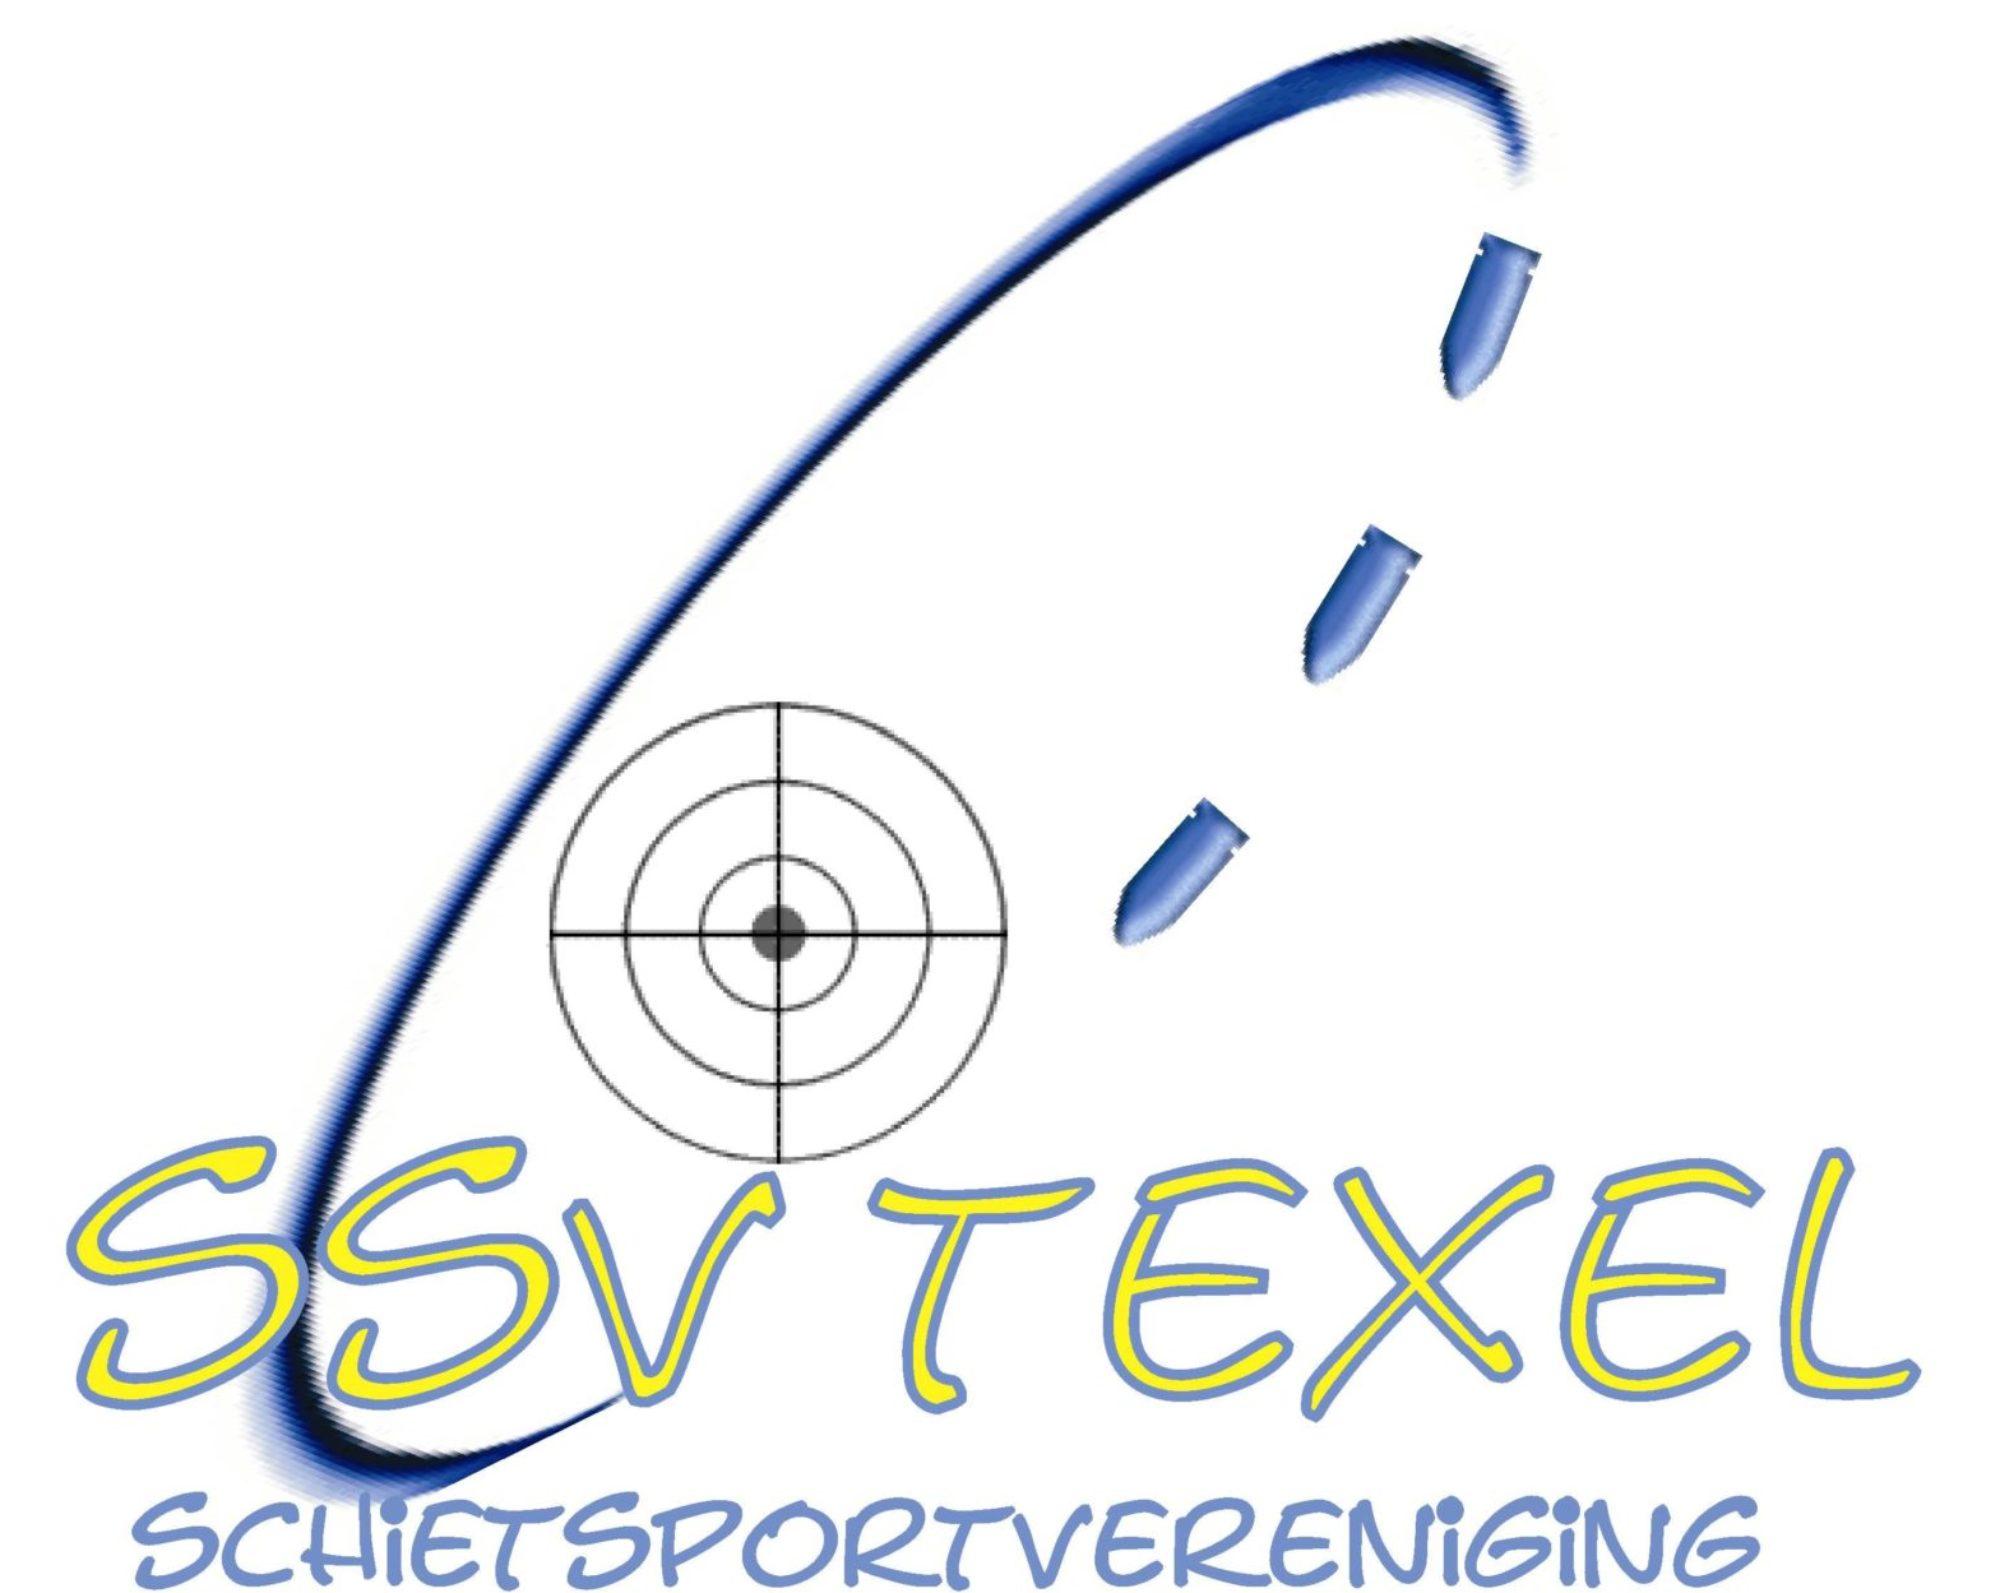 SSV Texel